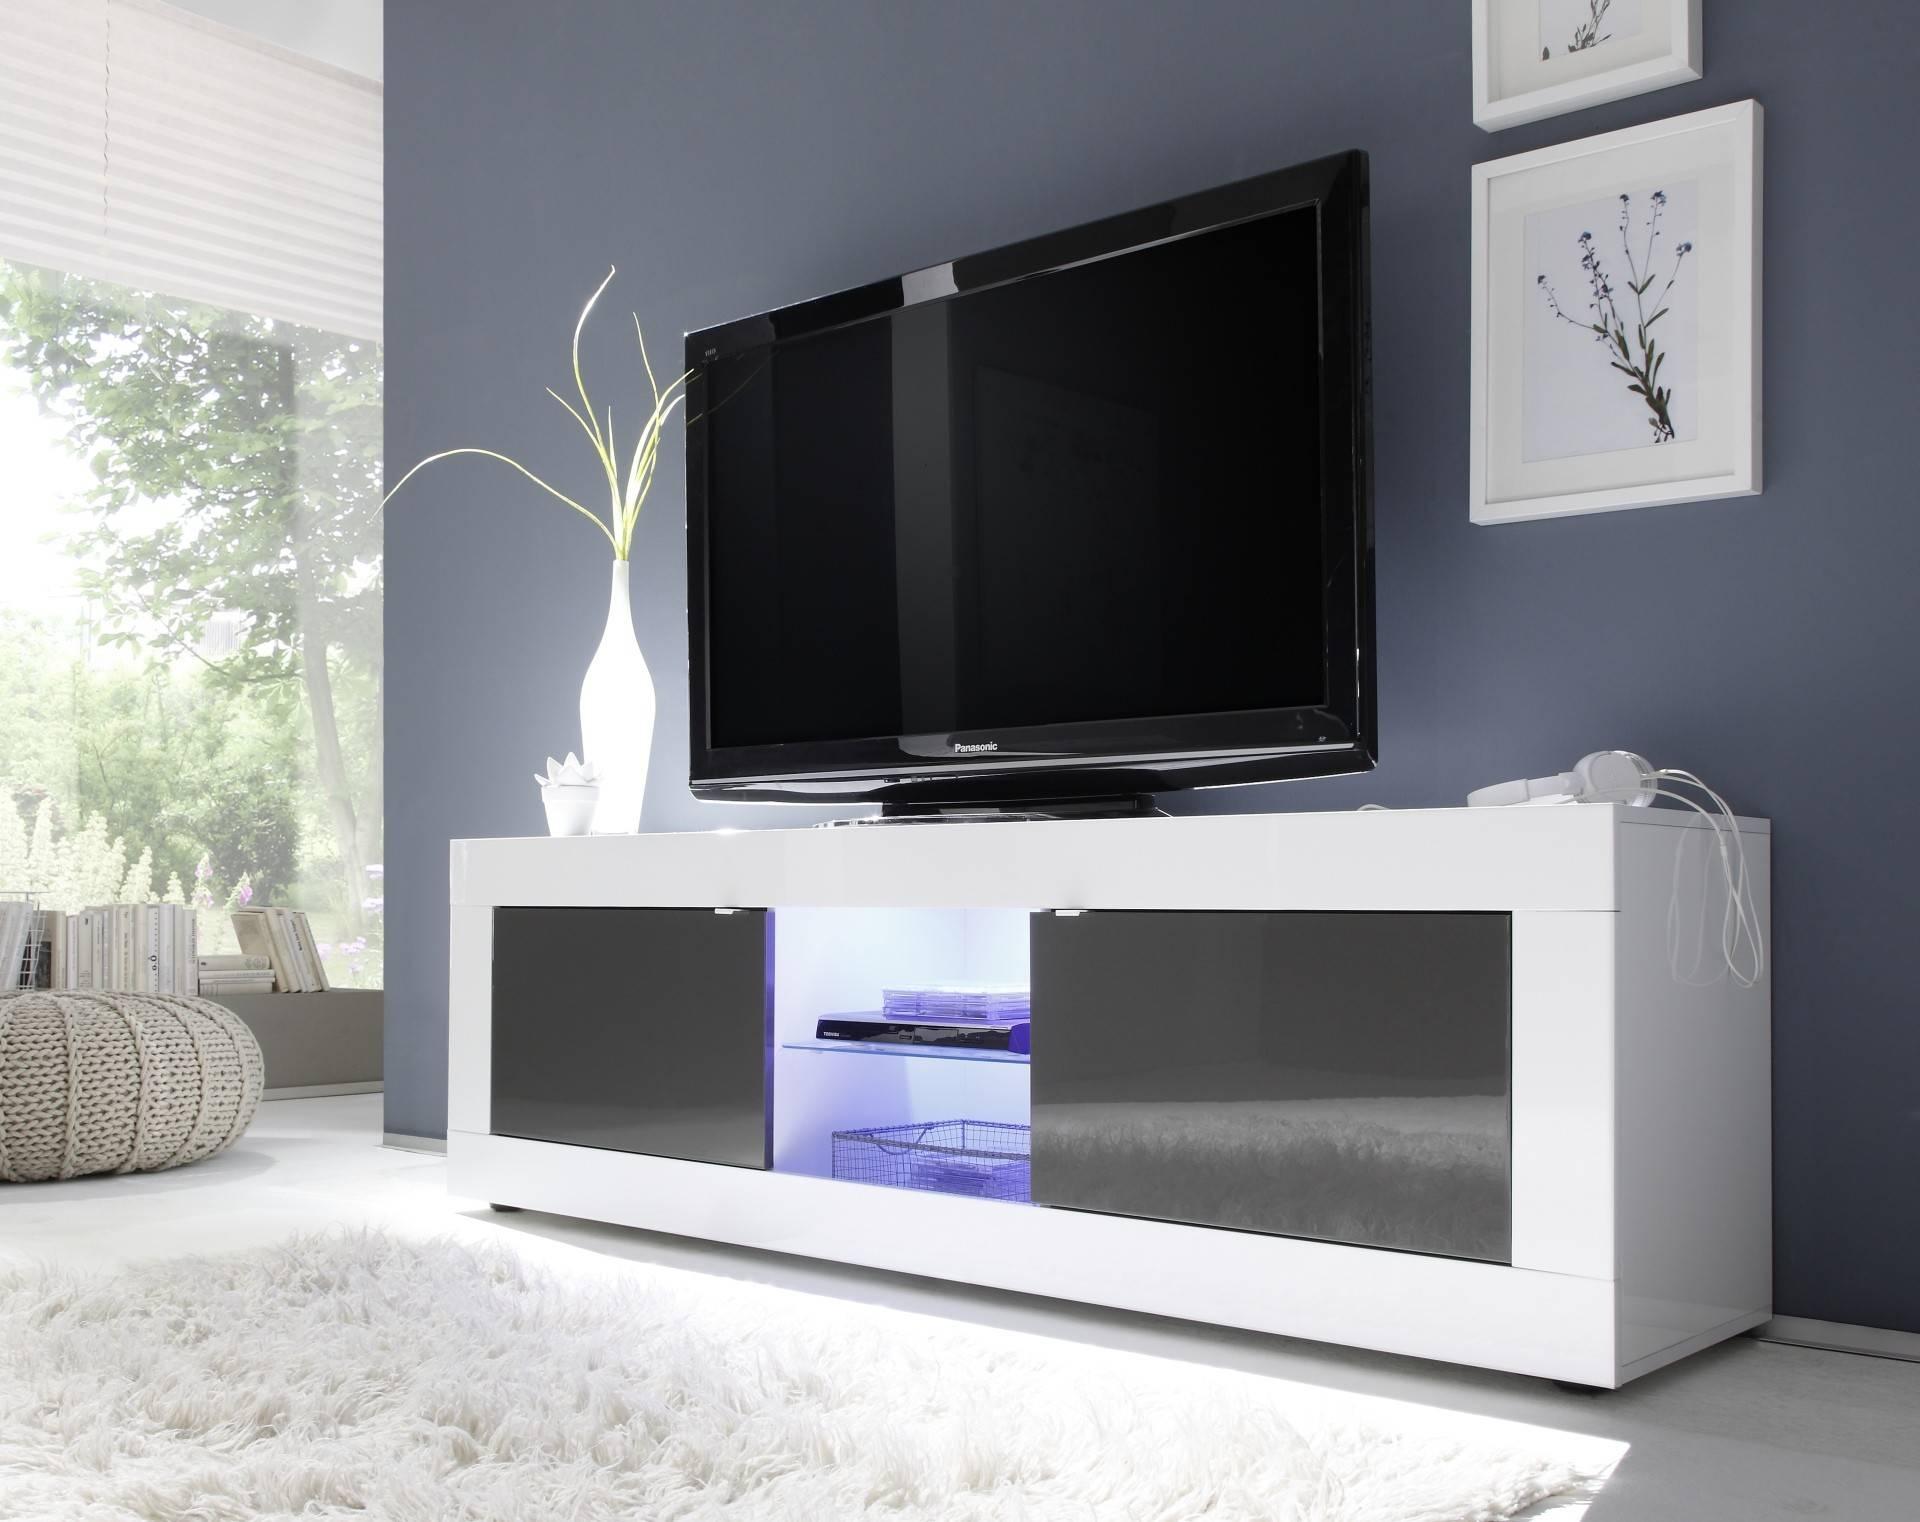 Corner Tv Stand For 60 Inch Flat Screen Tv regarding Corner 60 Inch Tv Stands (Image 6 of 15)